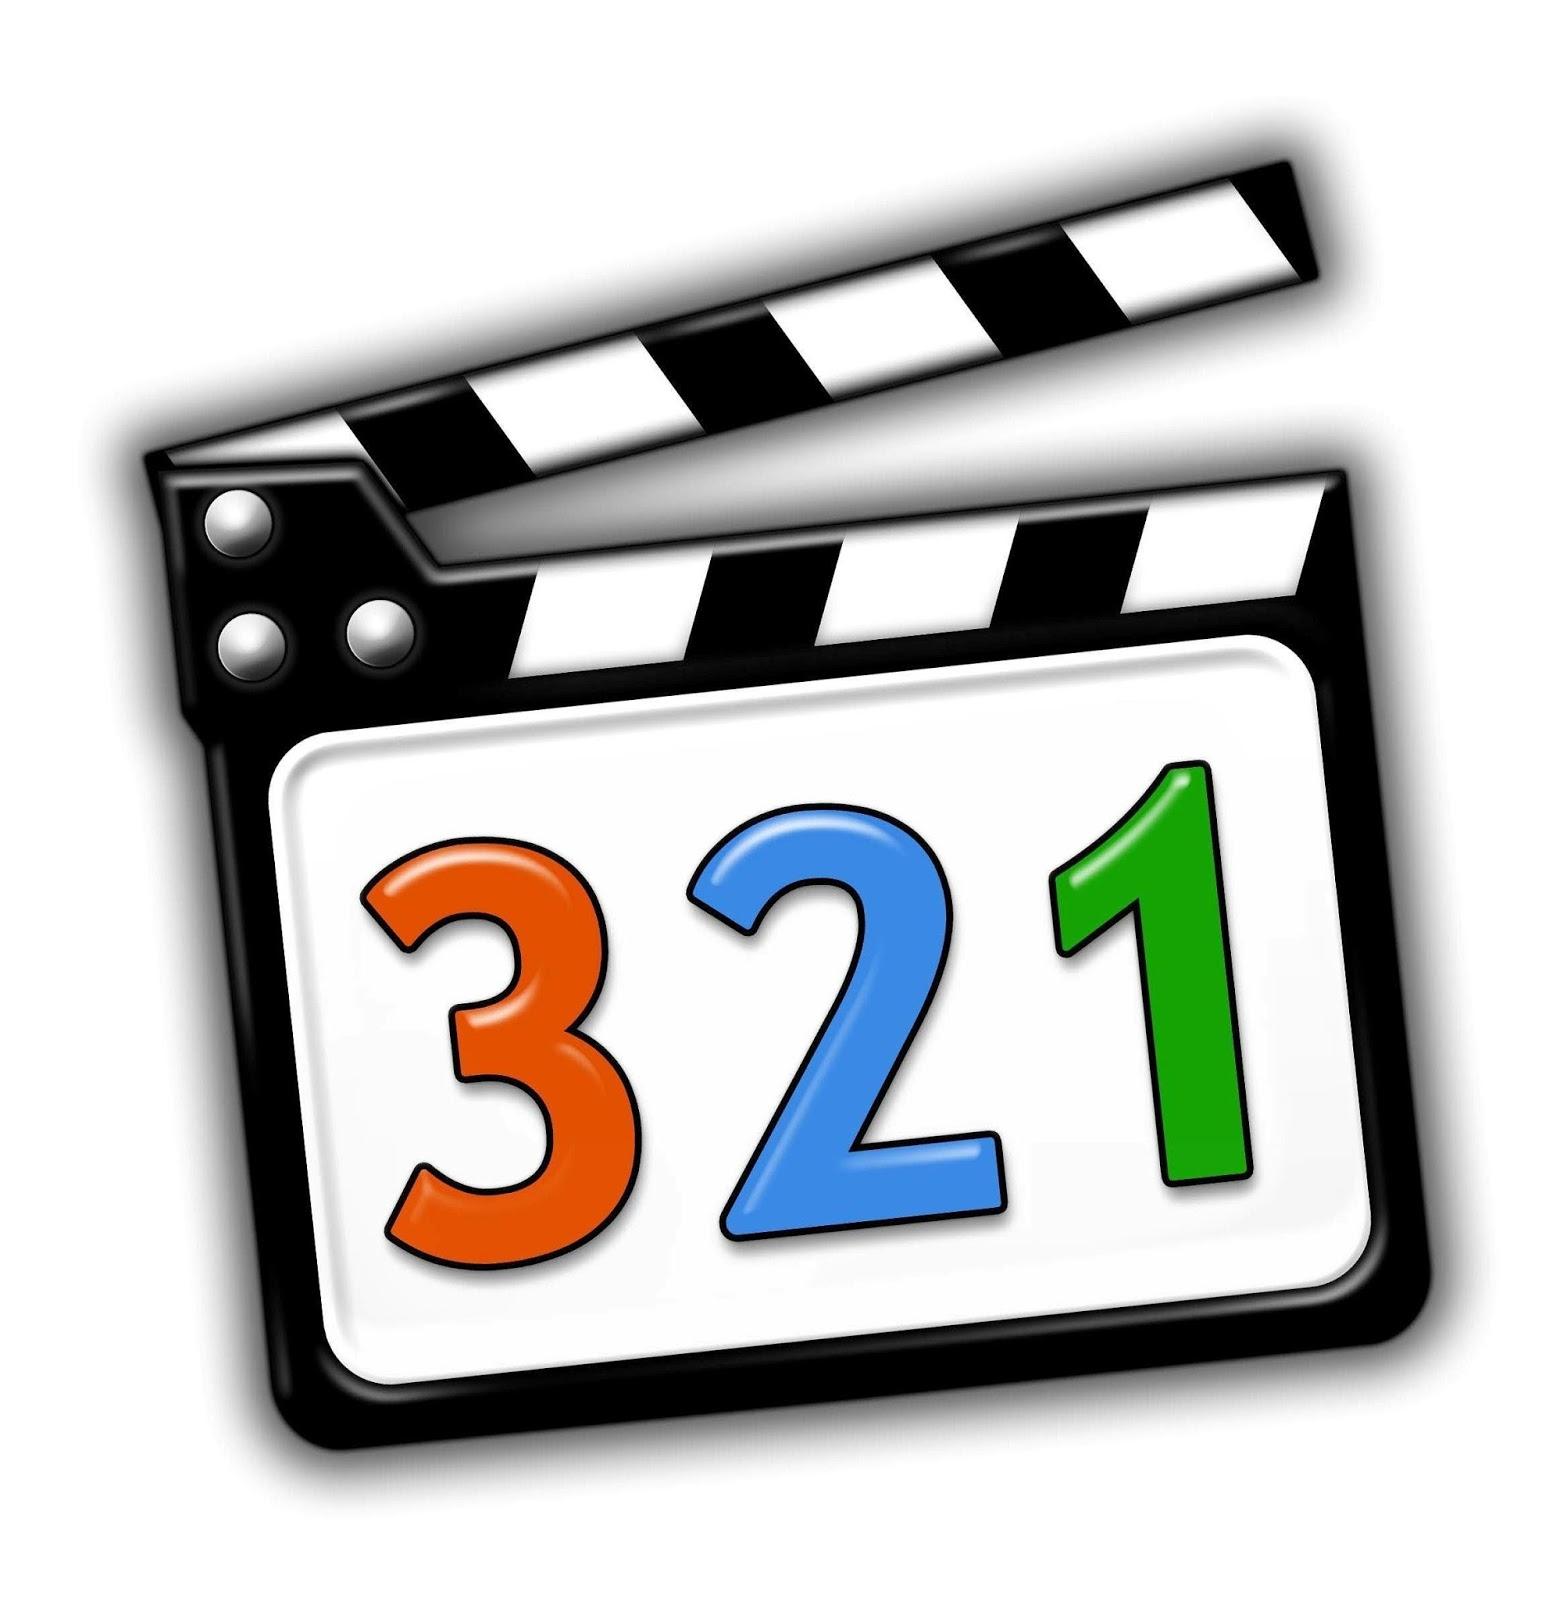 K-lite codec pack full 13. 2. 3 download for windows / filehorse. Com.